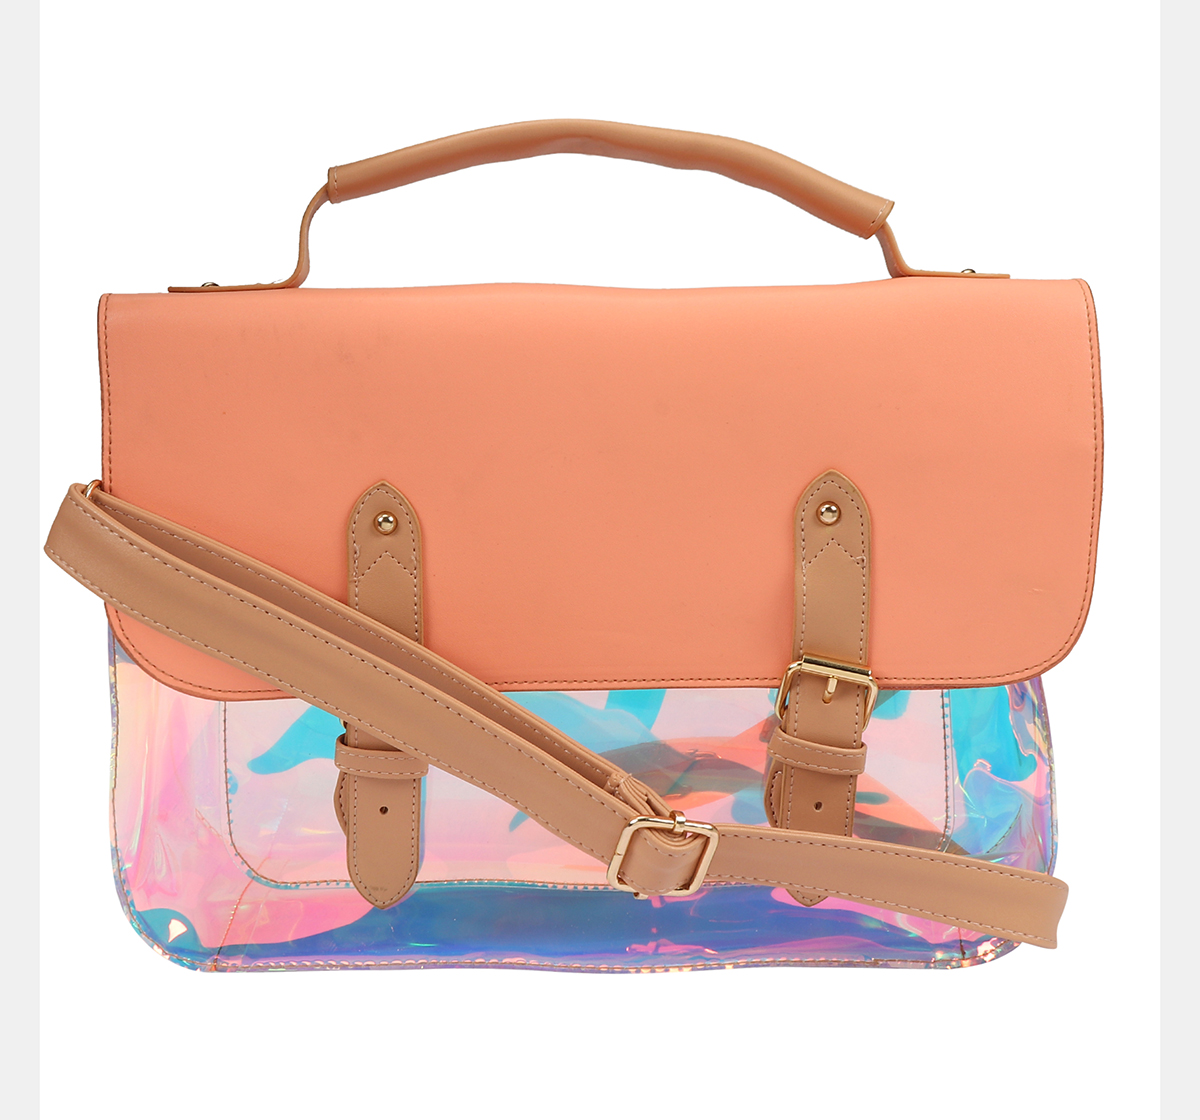 Hamster London | Hamster London Laptop Bag Orange, 8Y+